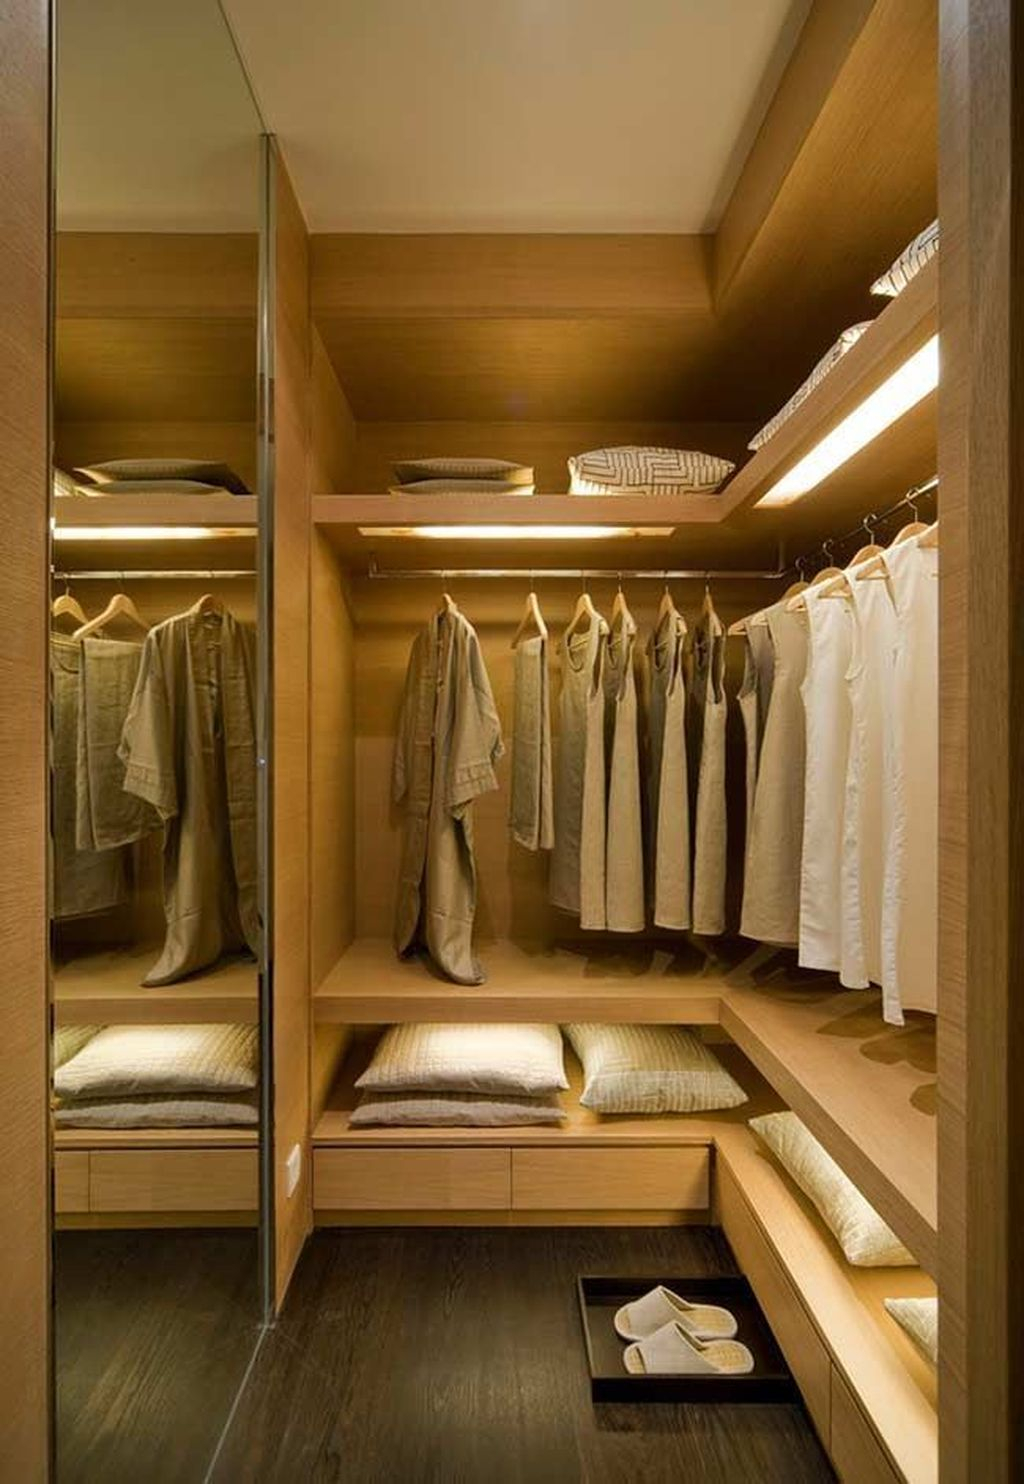 Rustic Wardrobe Design Ideas That Is In Trend 01